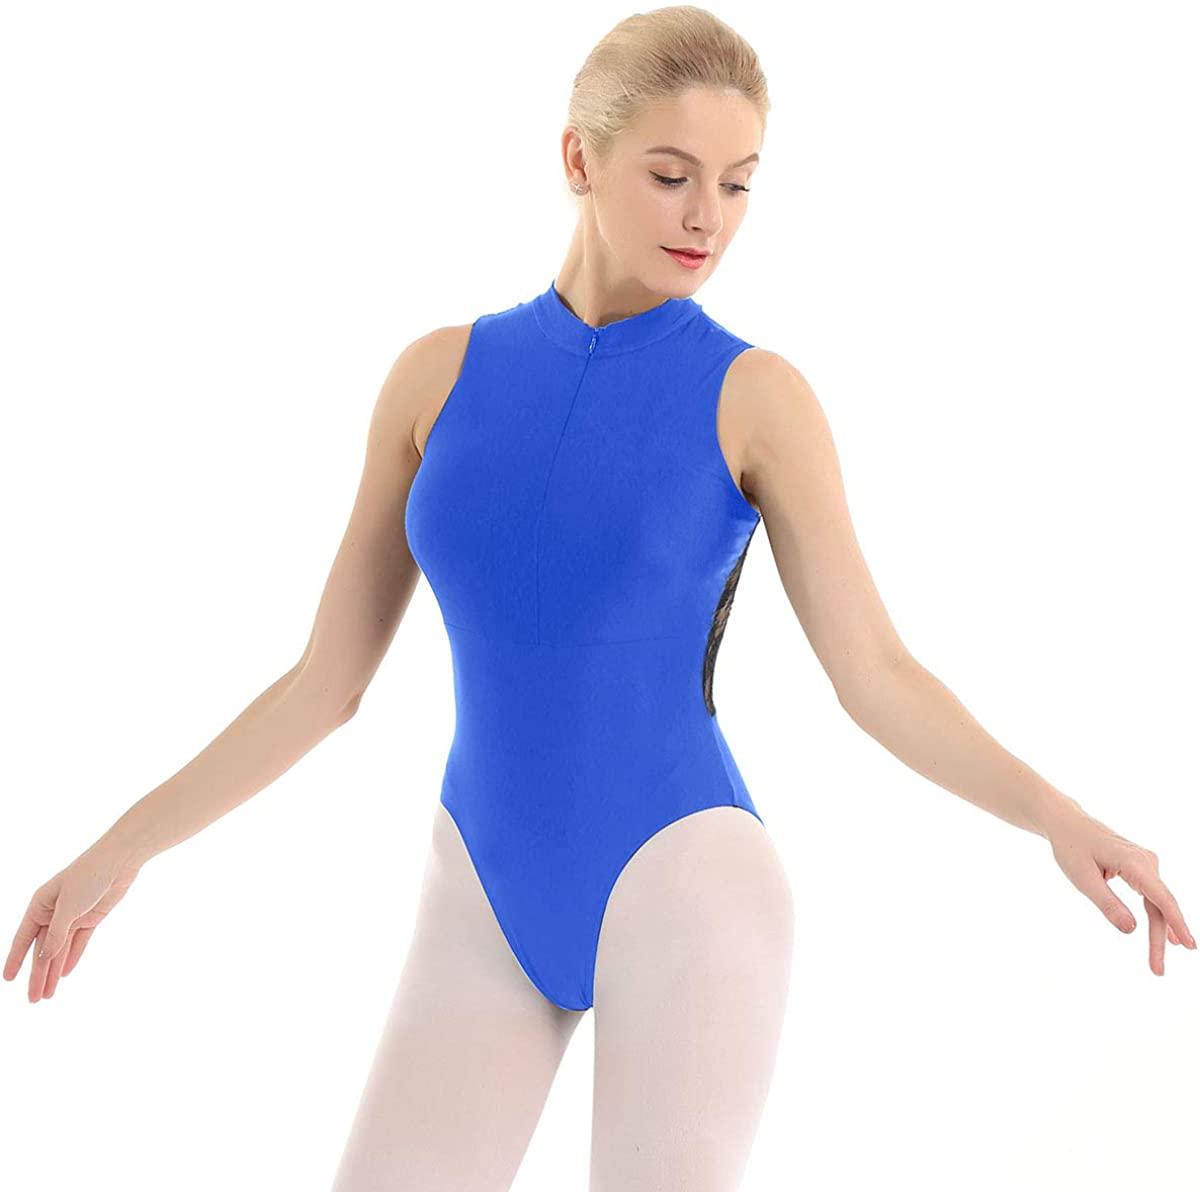 Freebily Womens Adult Mock Neck Spandex Lace Ballet Dance Gymnastics Leotard Bodysuit